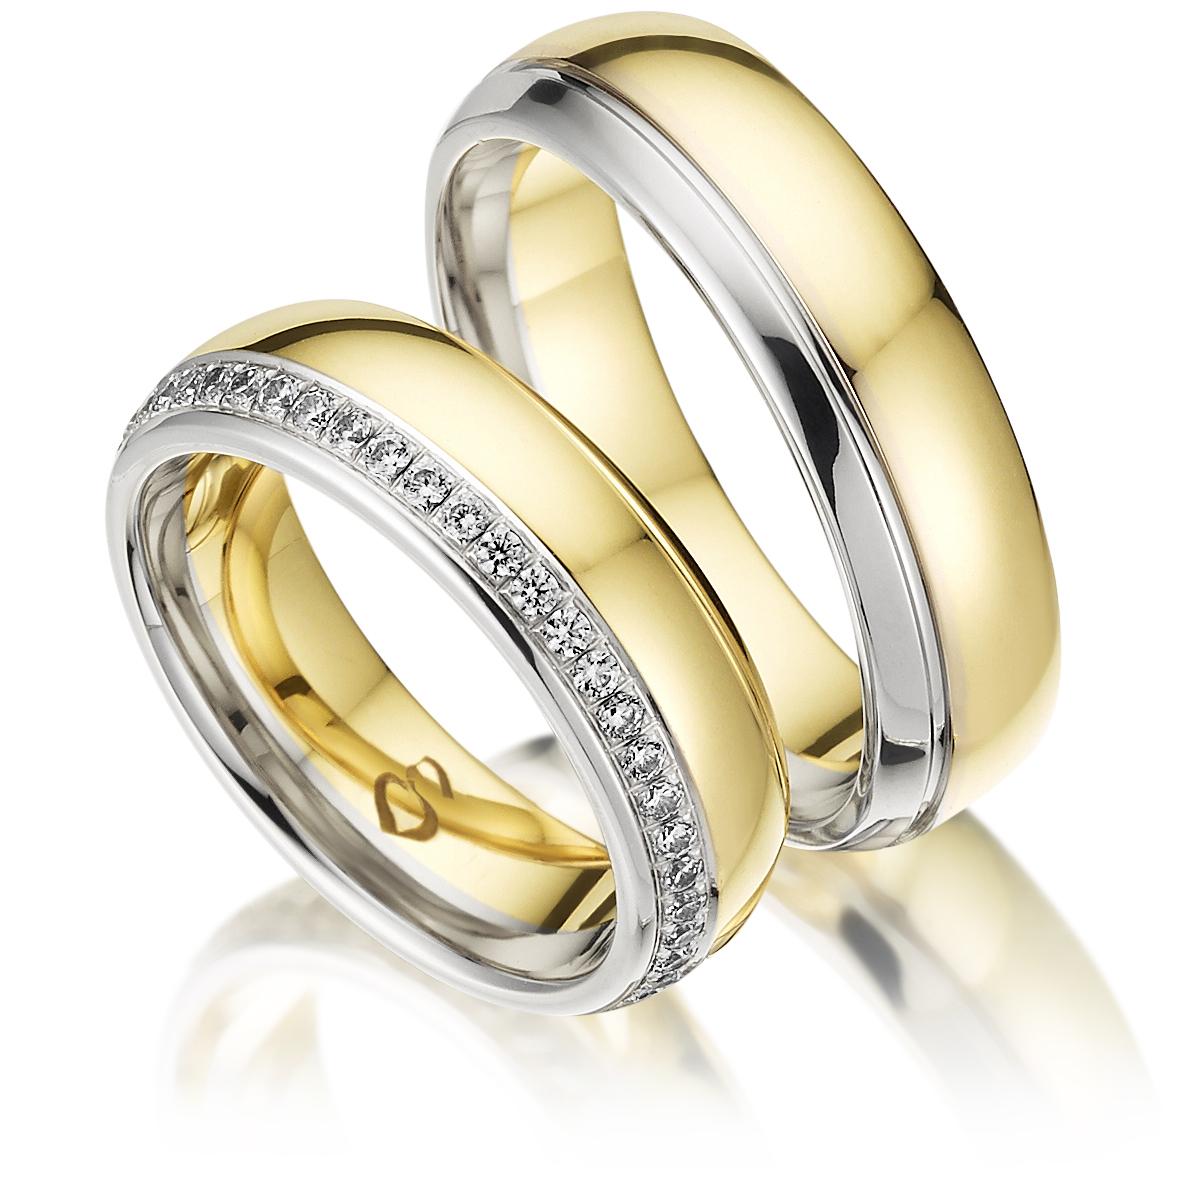 Trauringe 585 Gold 047 Karat Gold Ringe Mit Diamant Gravur